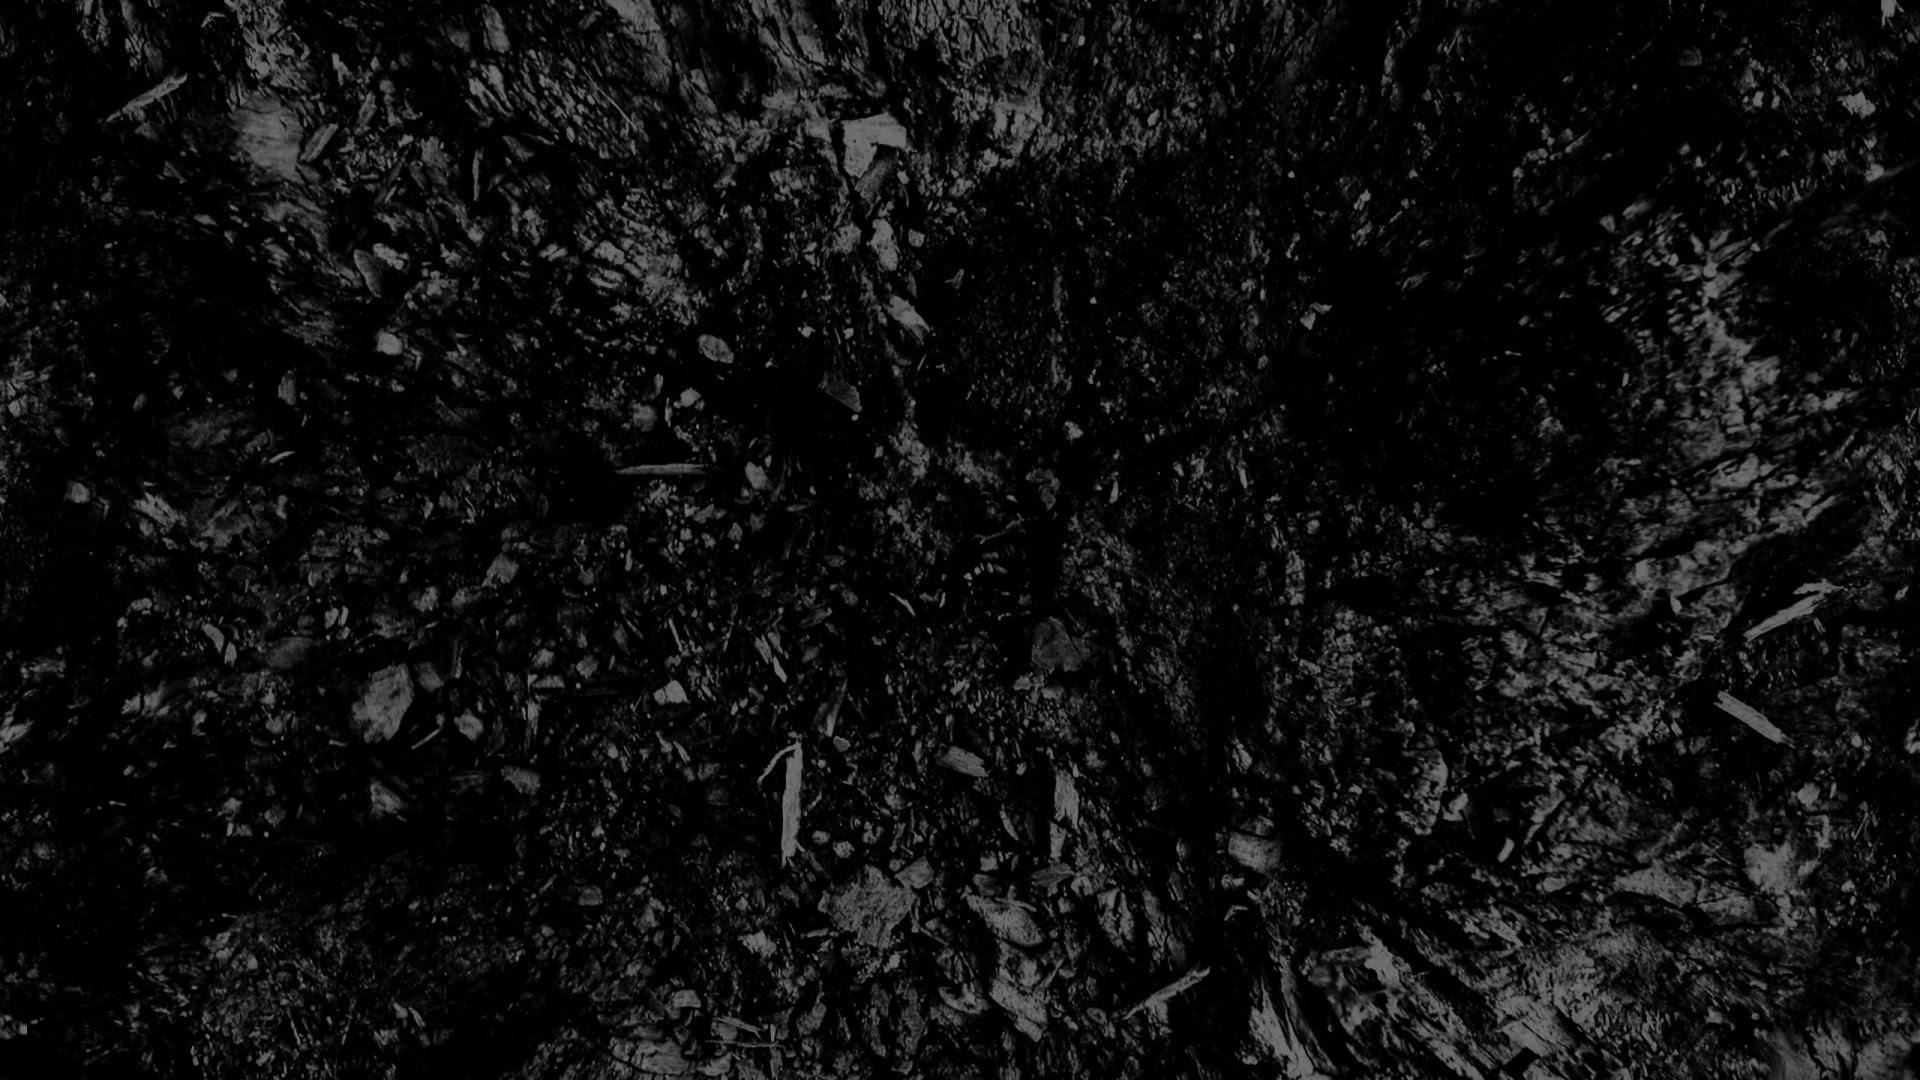 Unduh 8000 Wallpaper Black Abstract Hd HD Terbaru